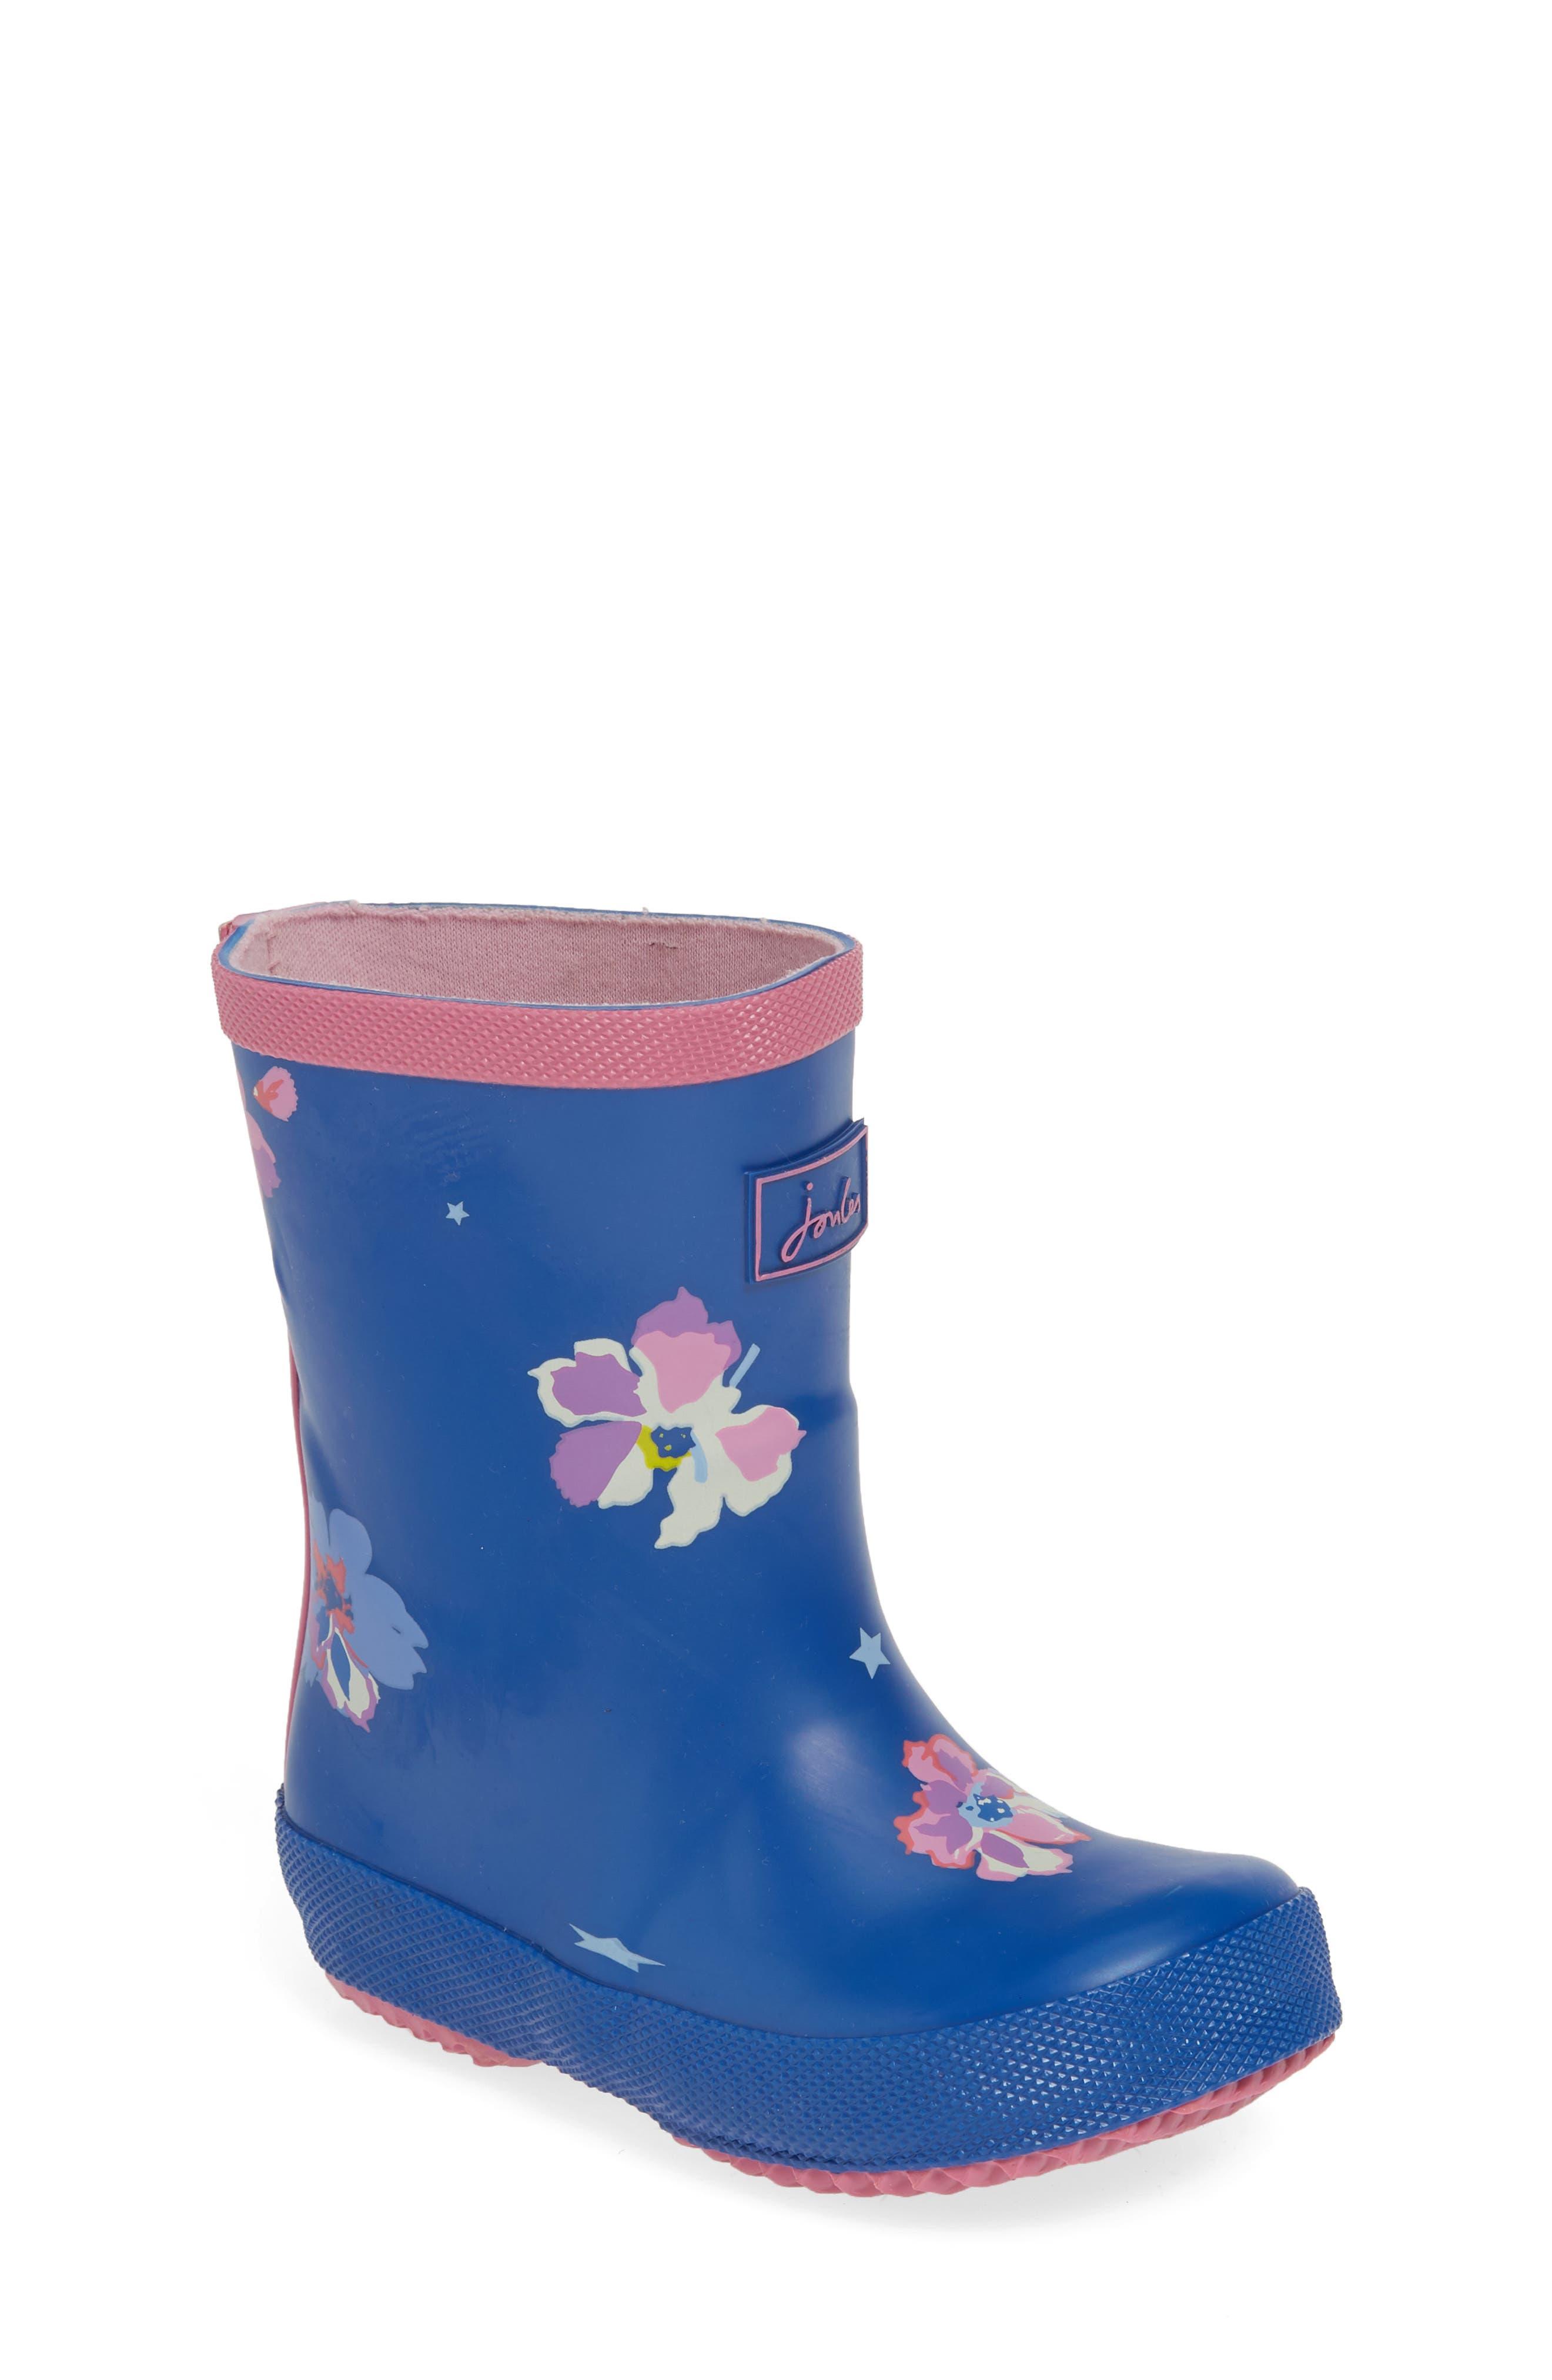 JOULES Print Waterproof Rain Boot, Main, color, BLUE CONFETTI FLORAL